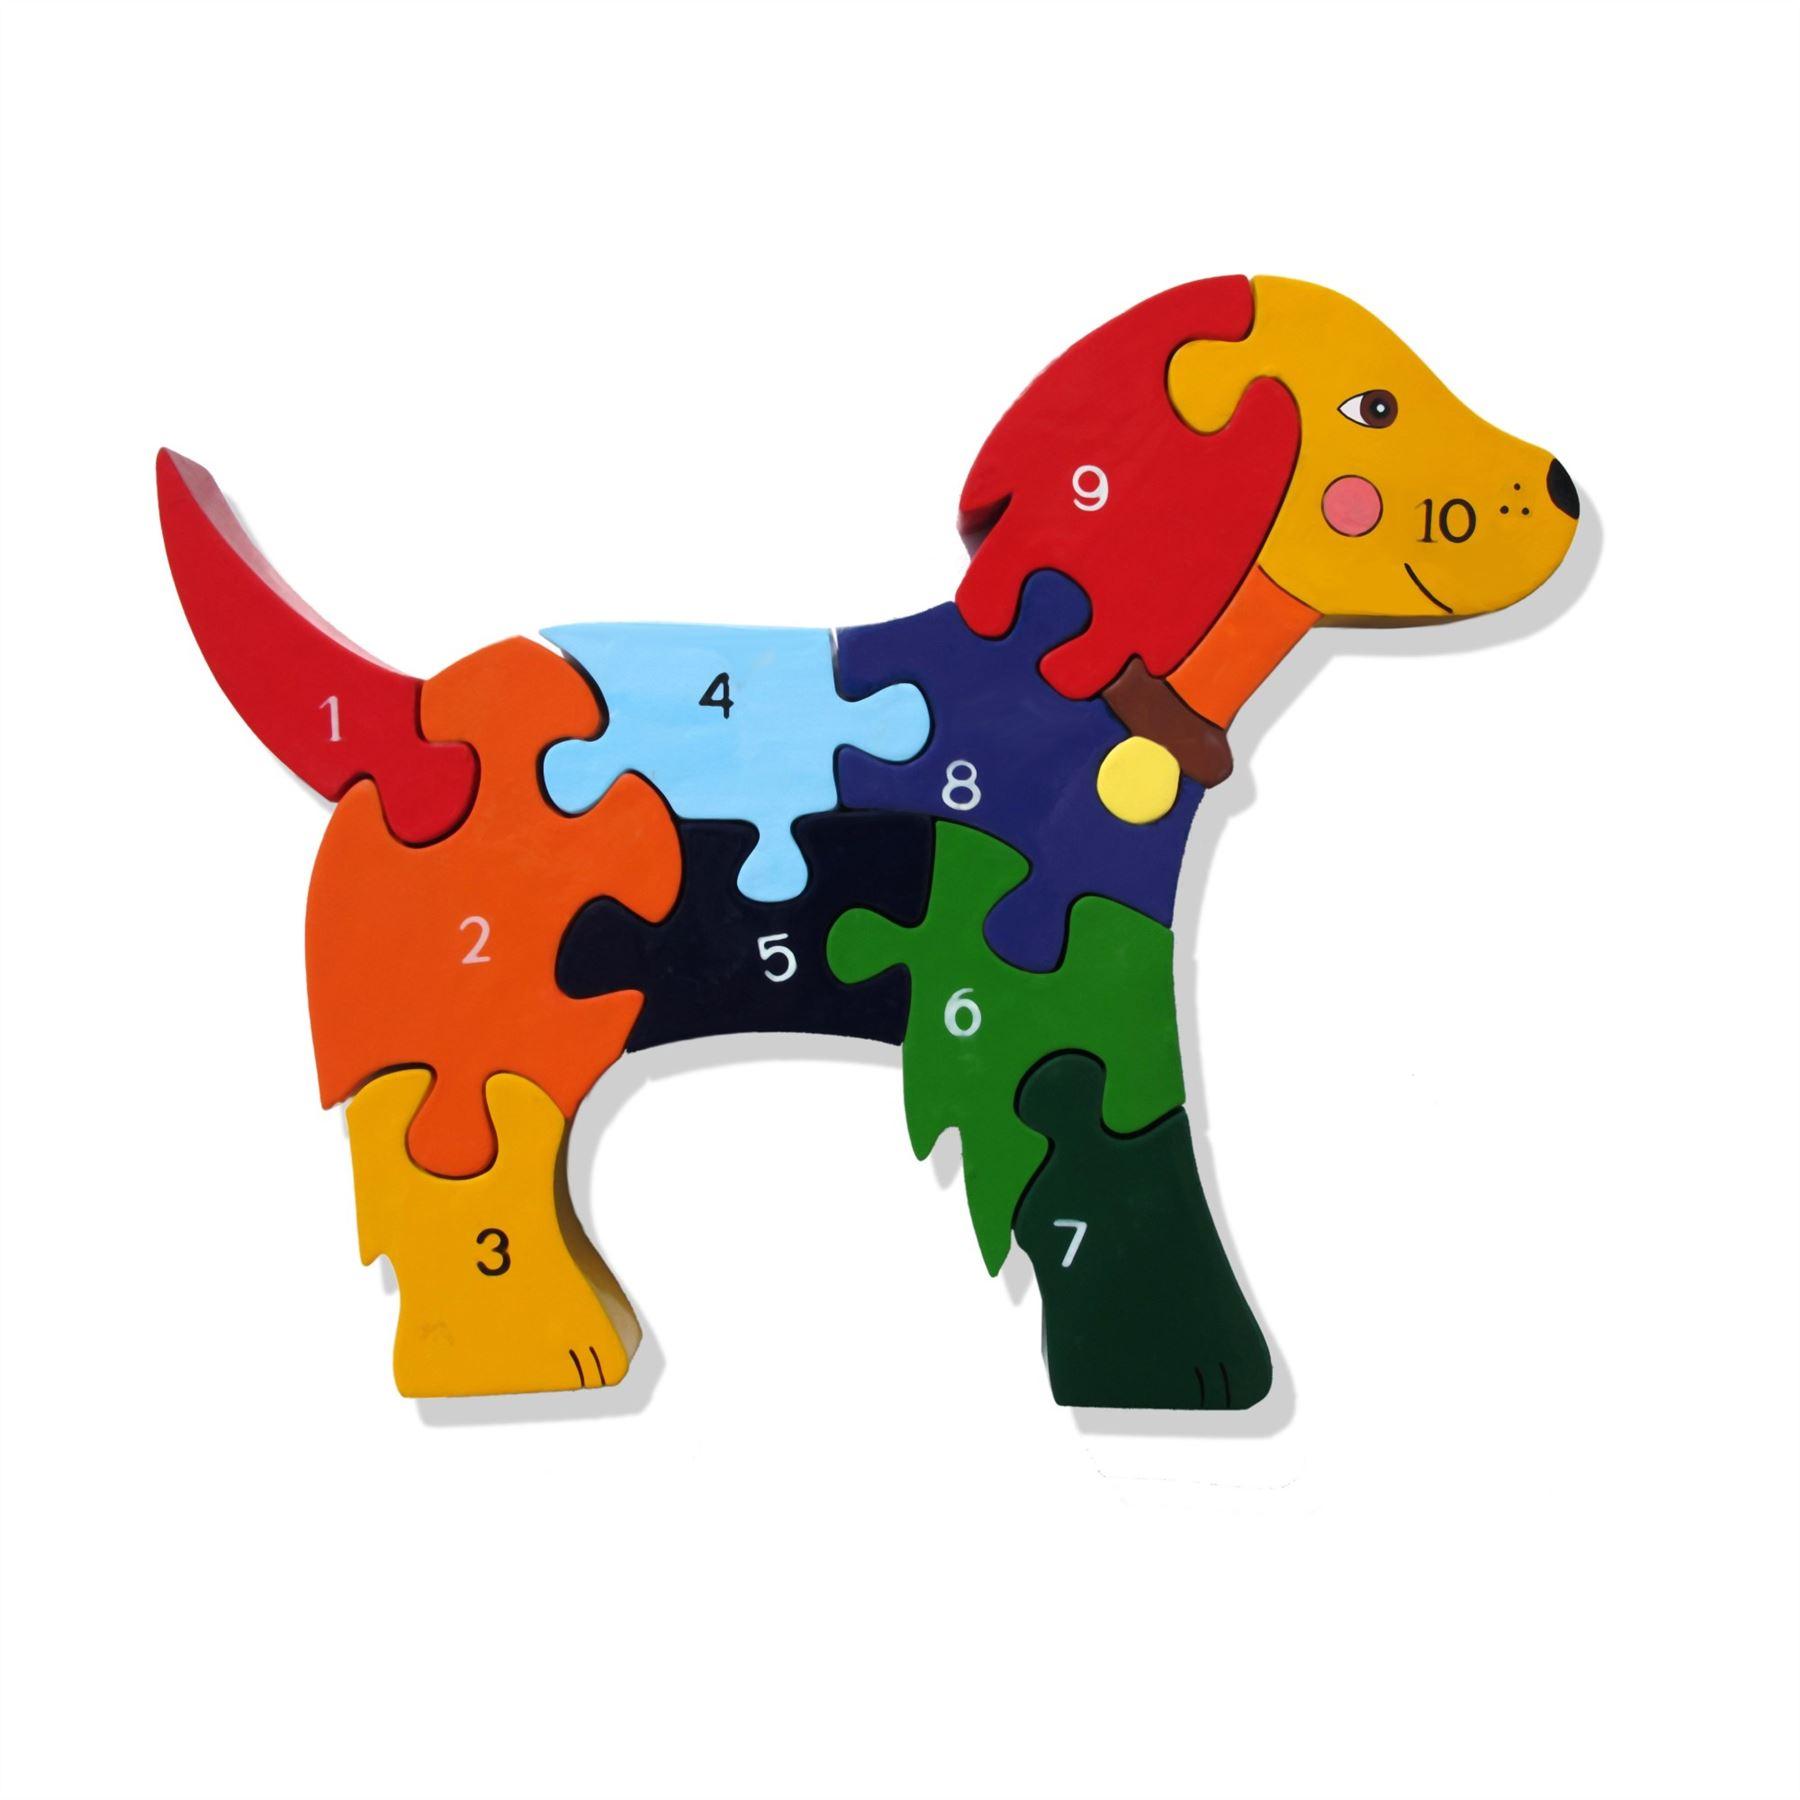 Alphabet Jigsaw Wooden Animal Puzzle In Elephant/Giraffe